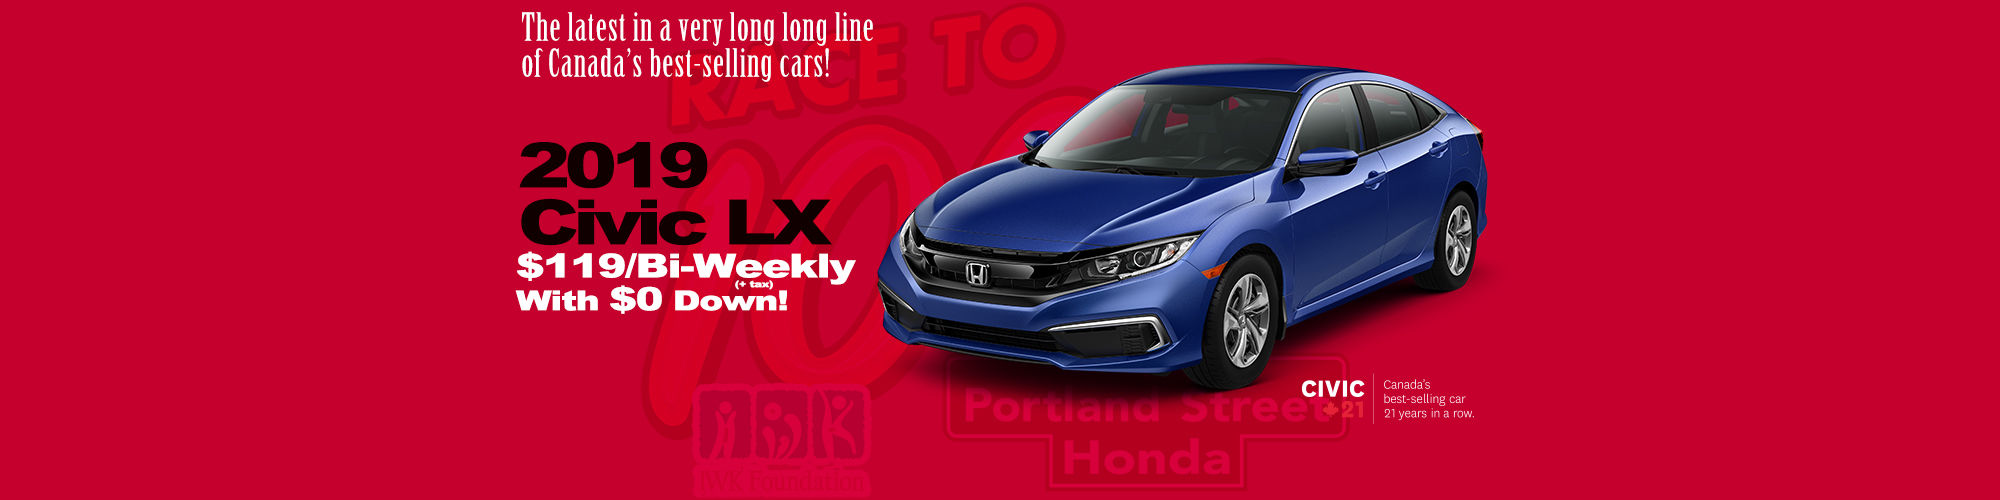 Honda Civic $119/Bi-Wekkly